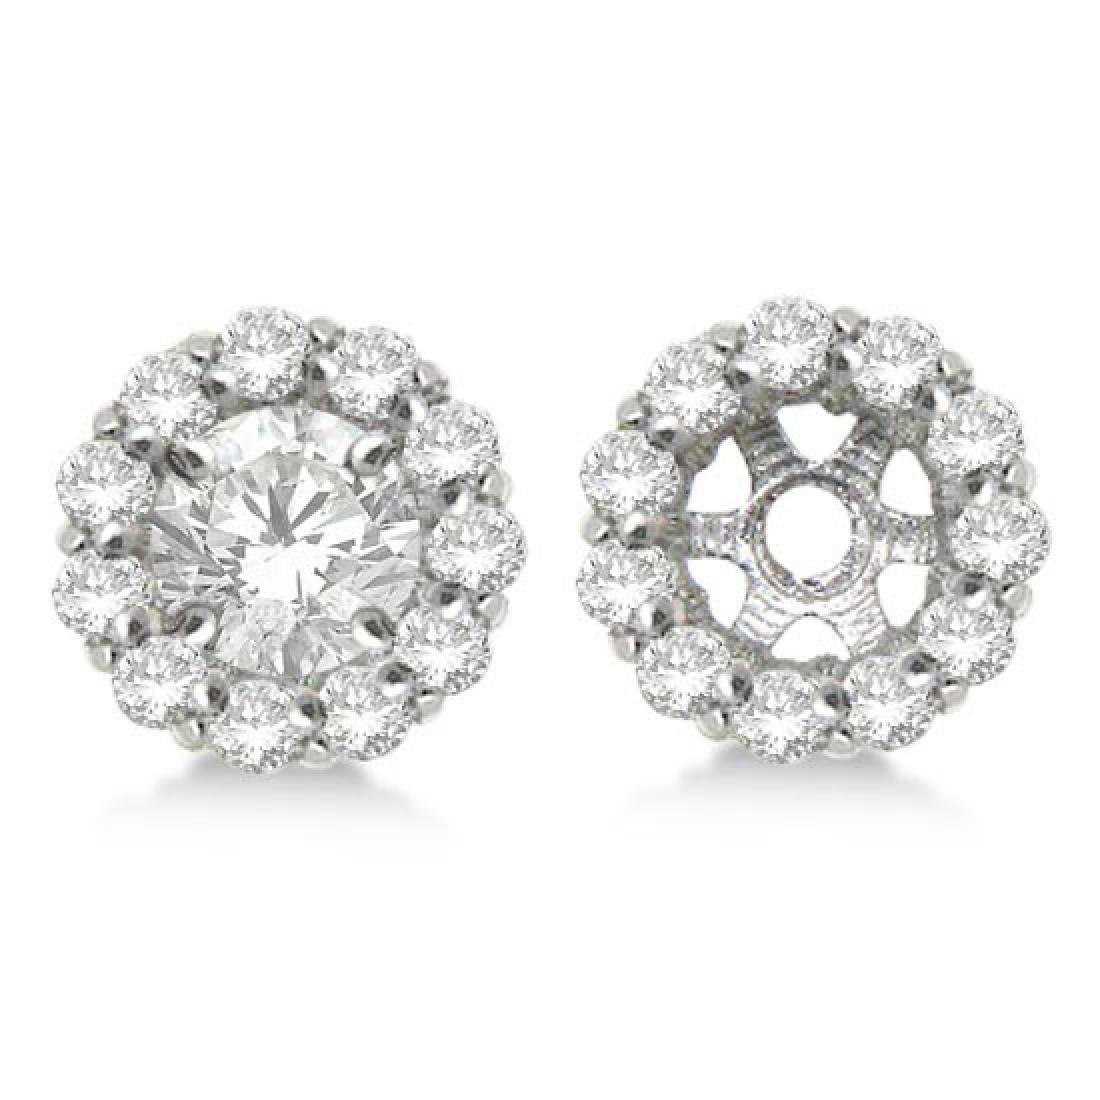 Round Diamond Earring Jackets for 6mm Studs 14K White G